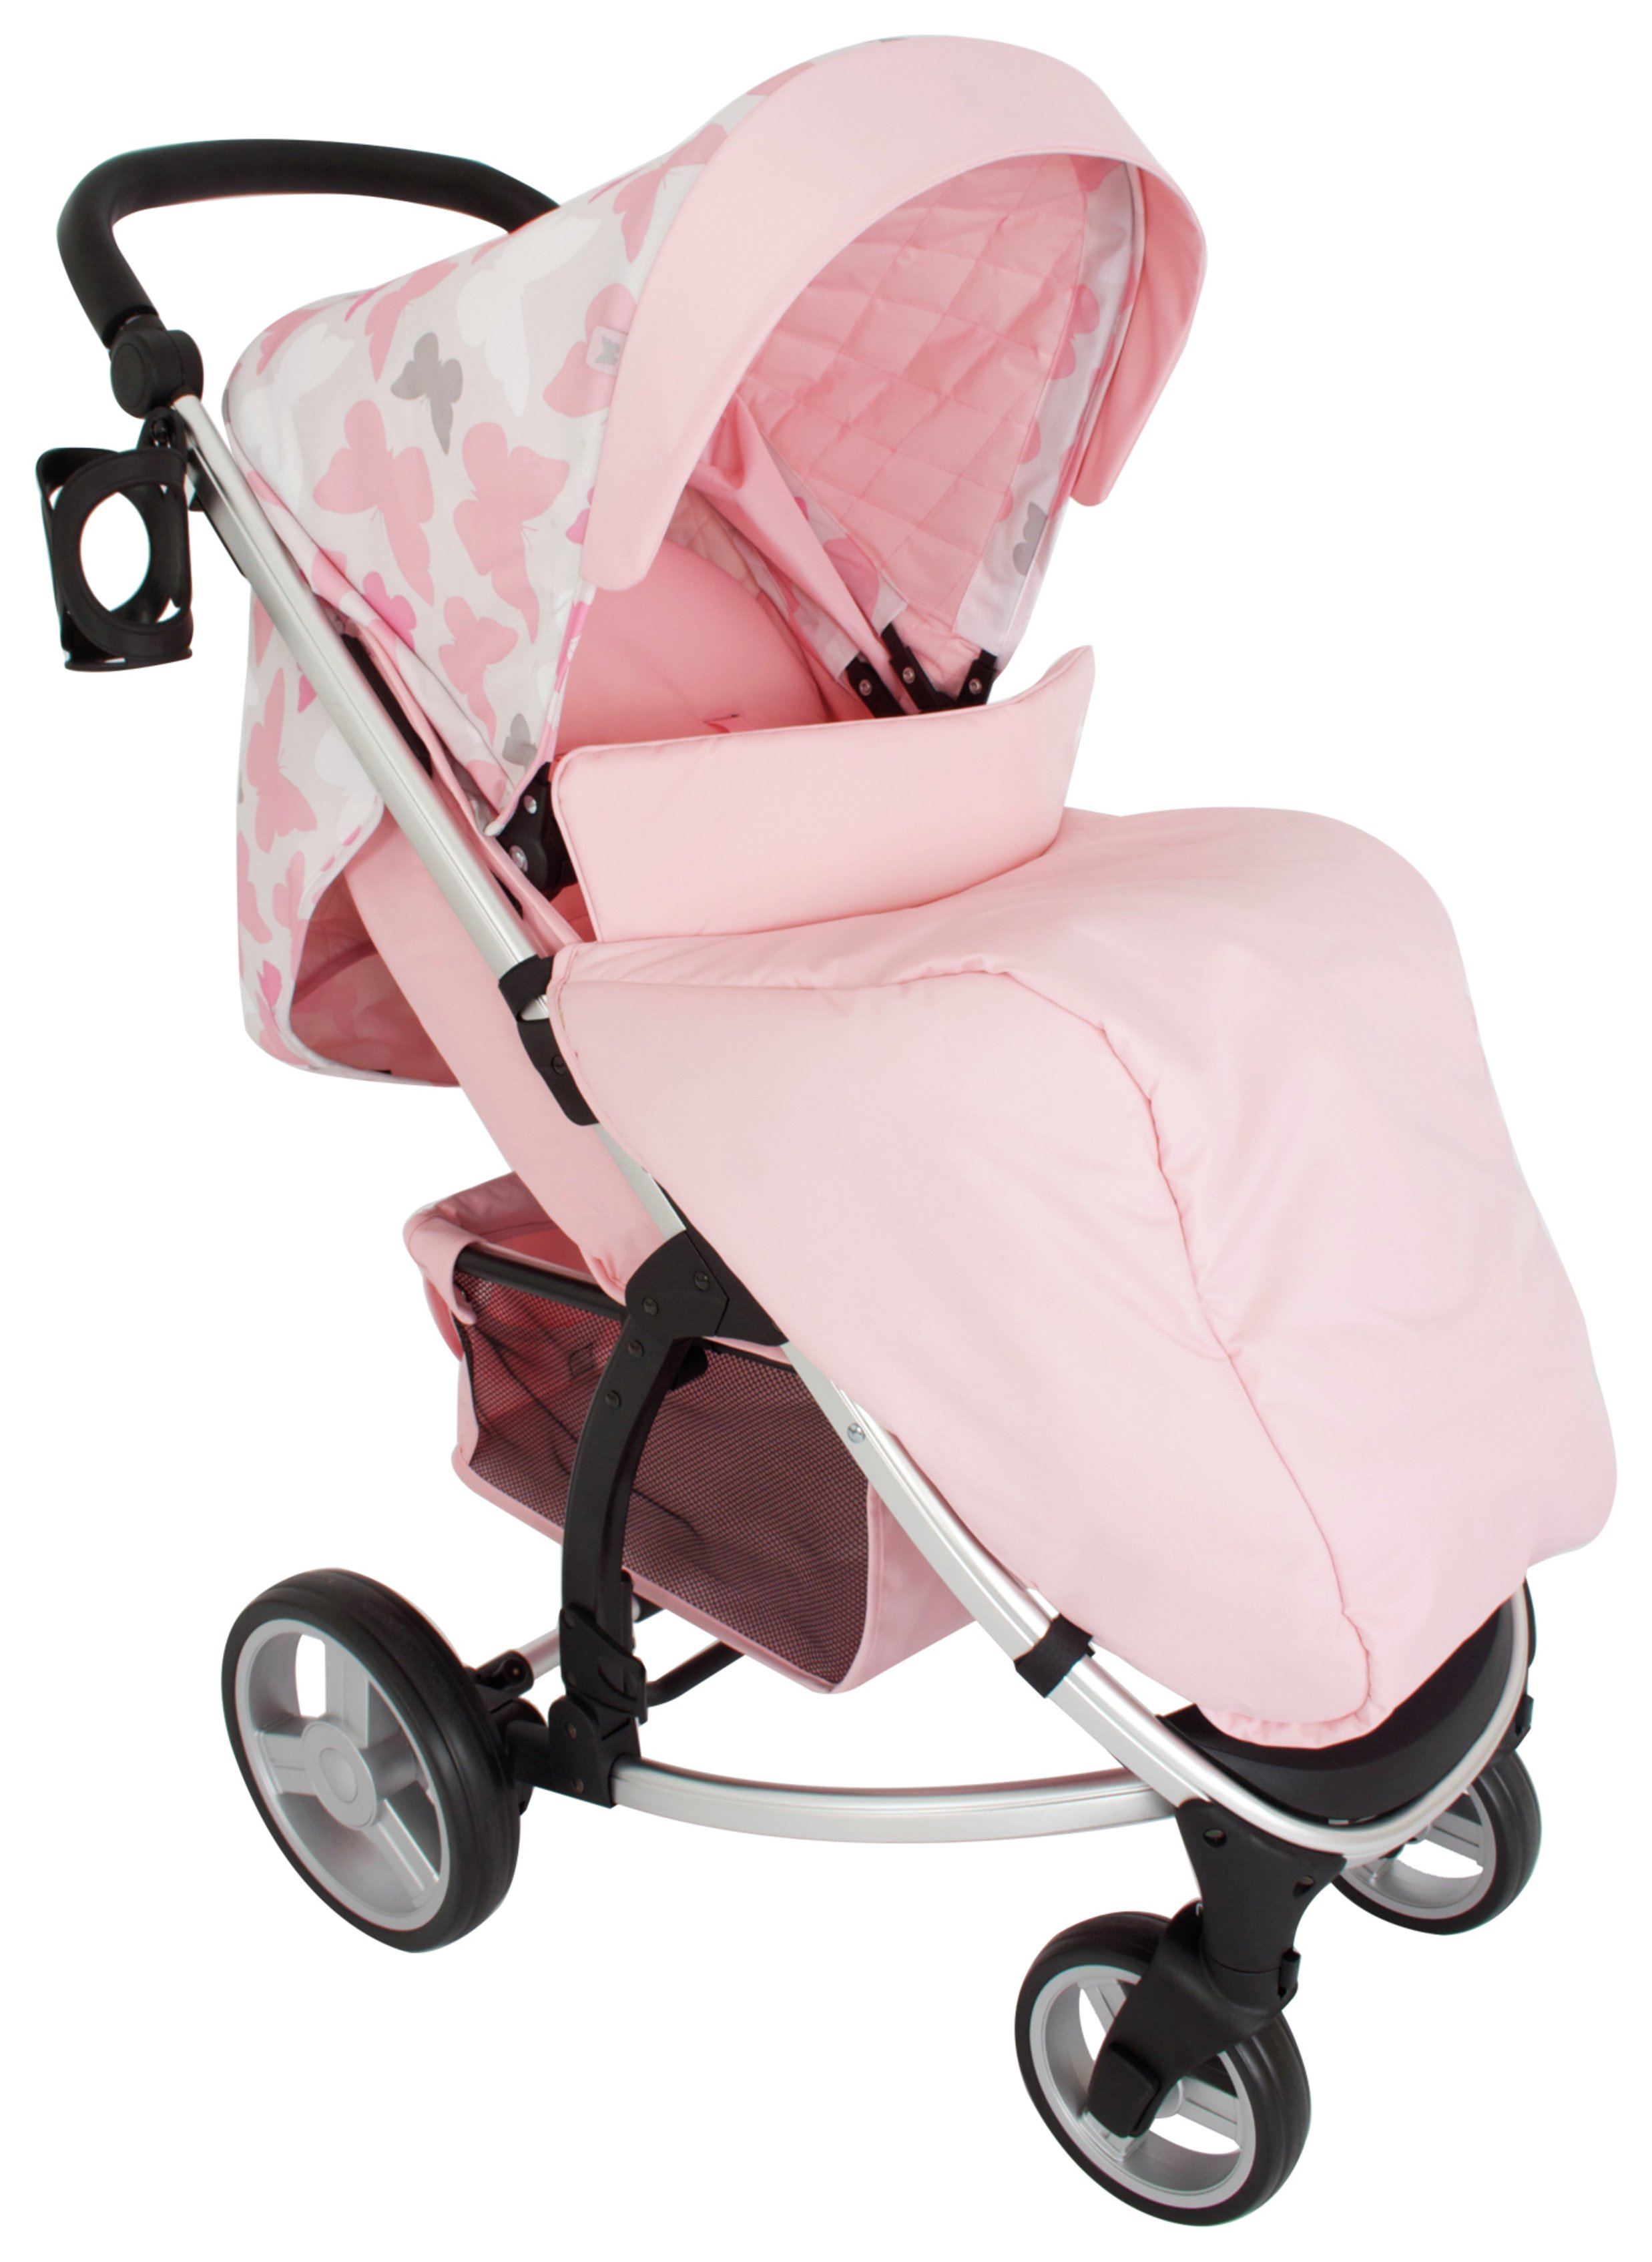 My Babiie MB200 KP Pushchair - Pink Butterlies